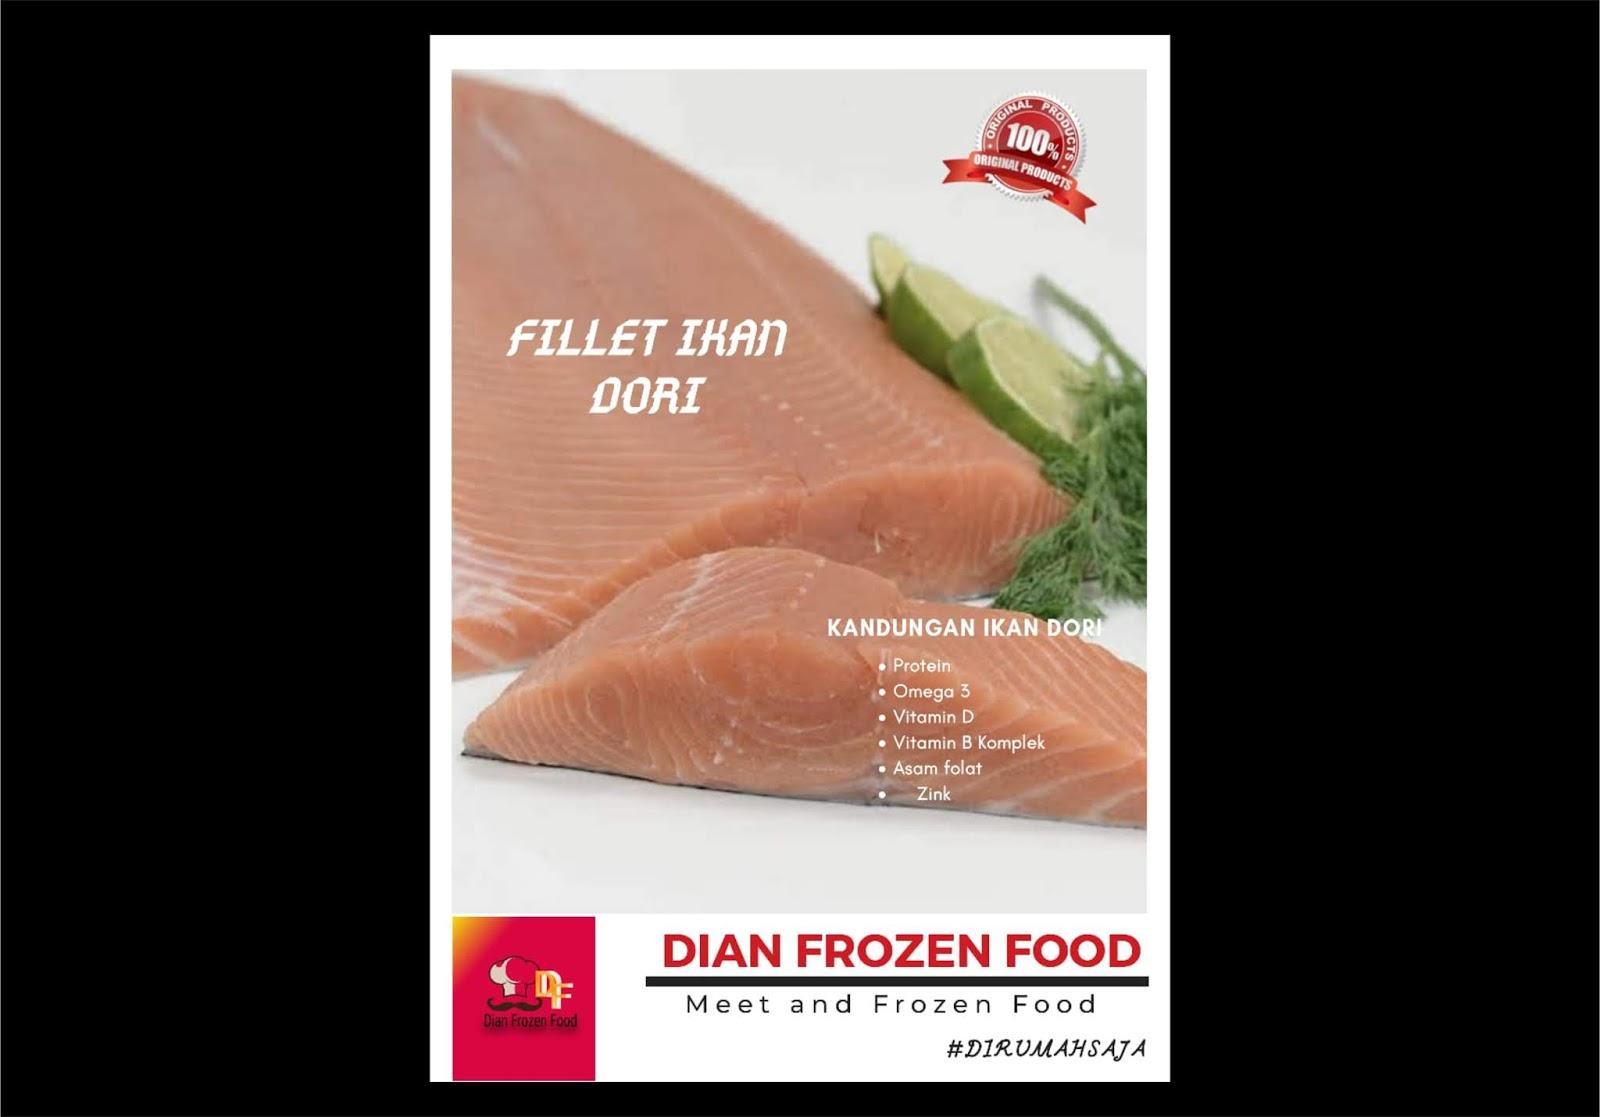 Fillet Ikan Dori 100gr